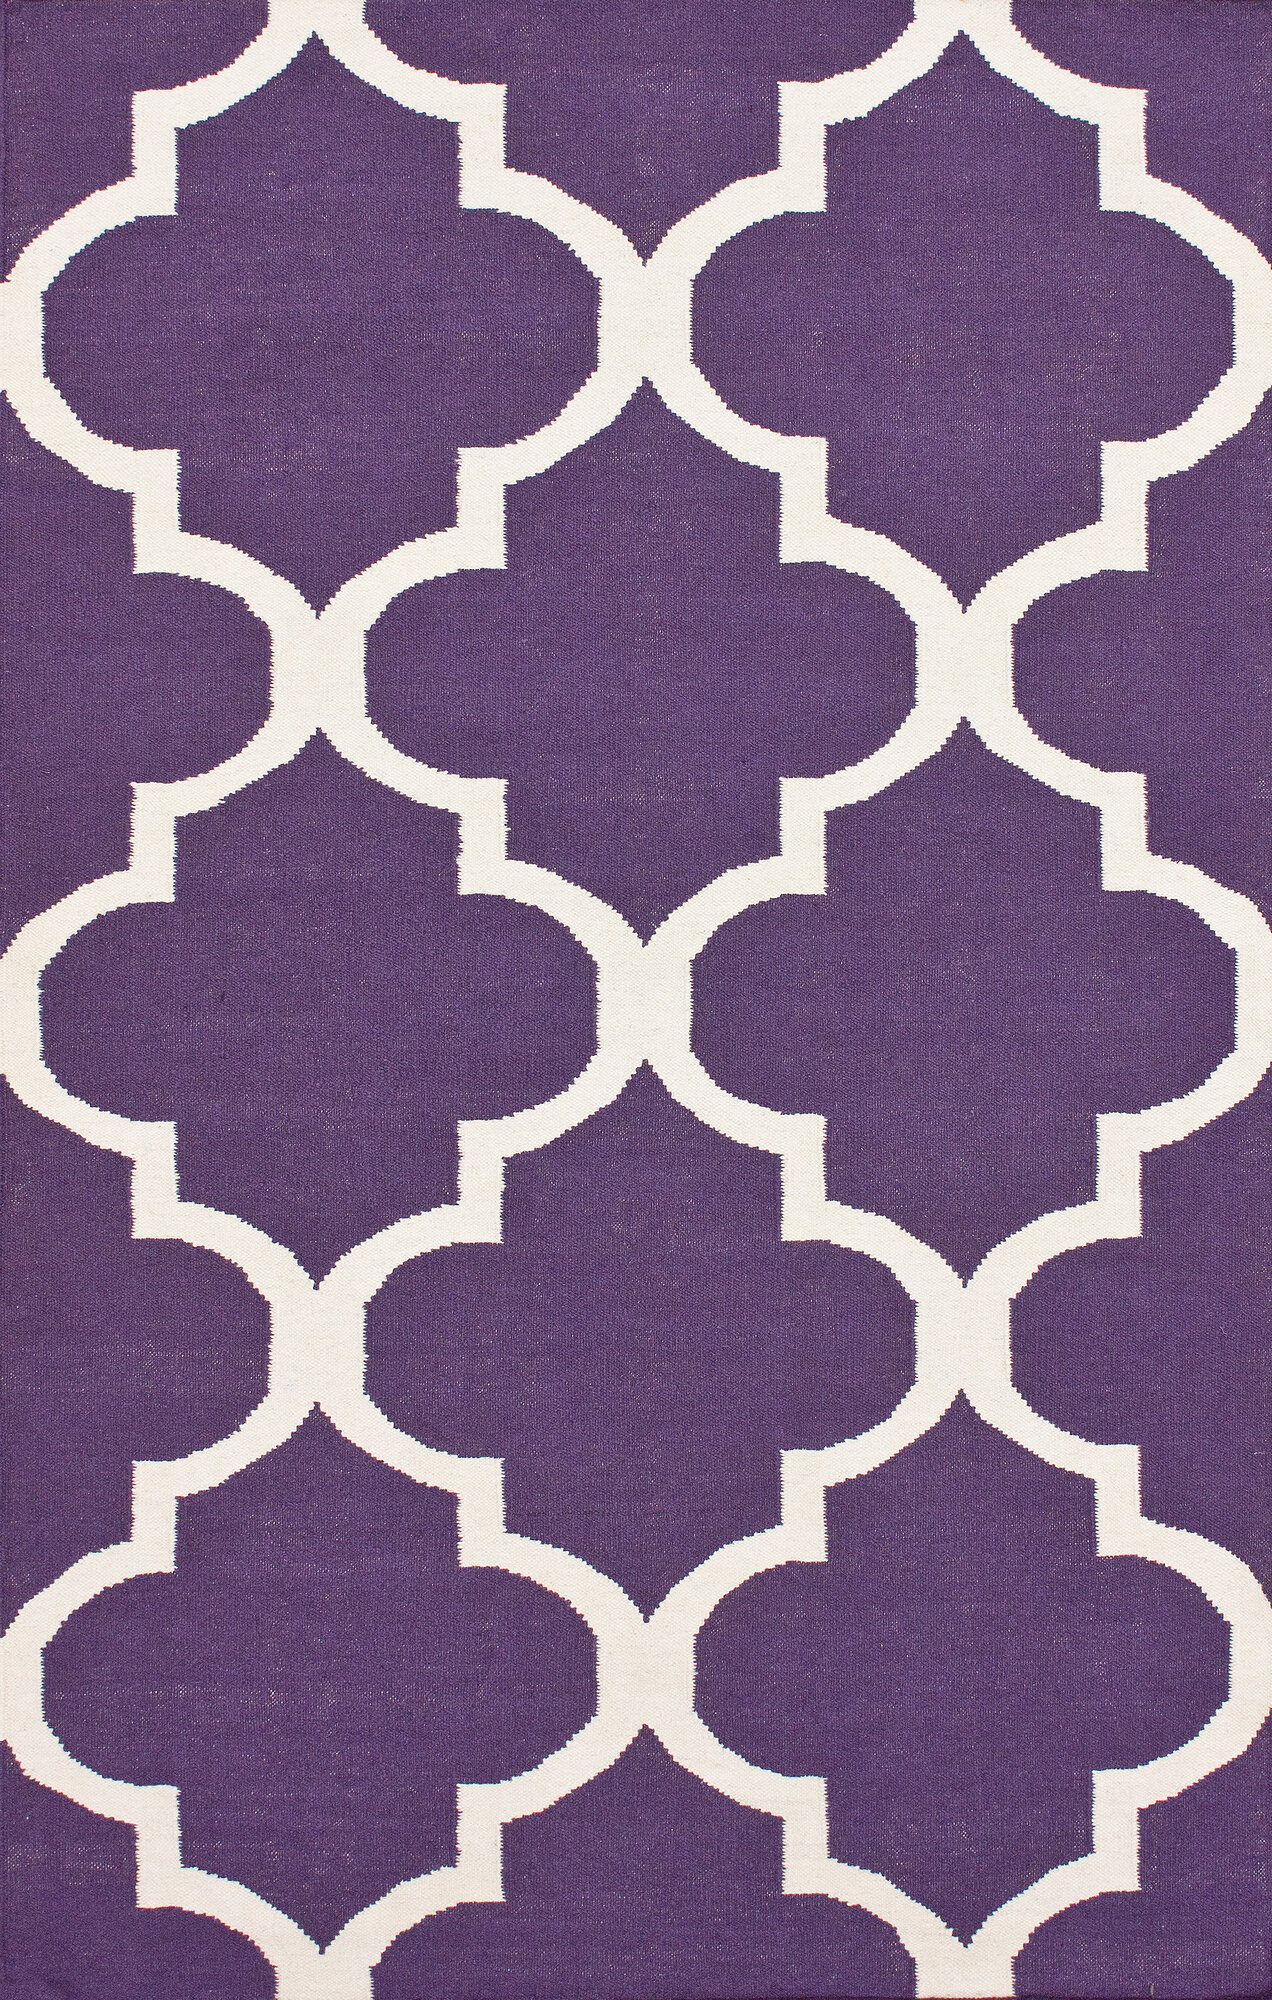 ... Marbella Moroccan Trellis Purple Kilim Rug ...